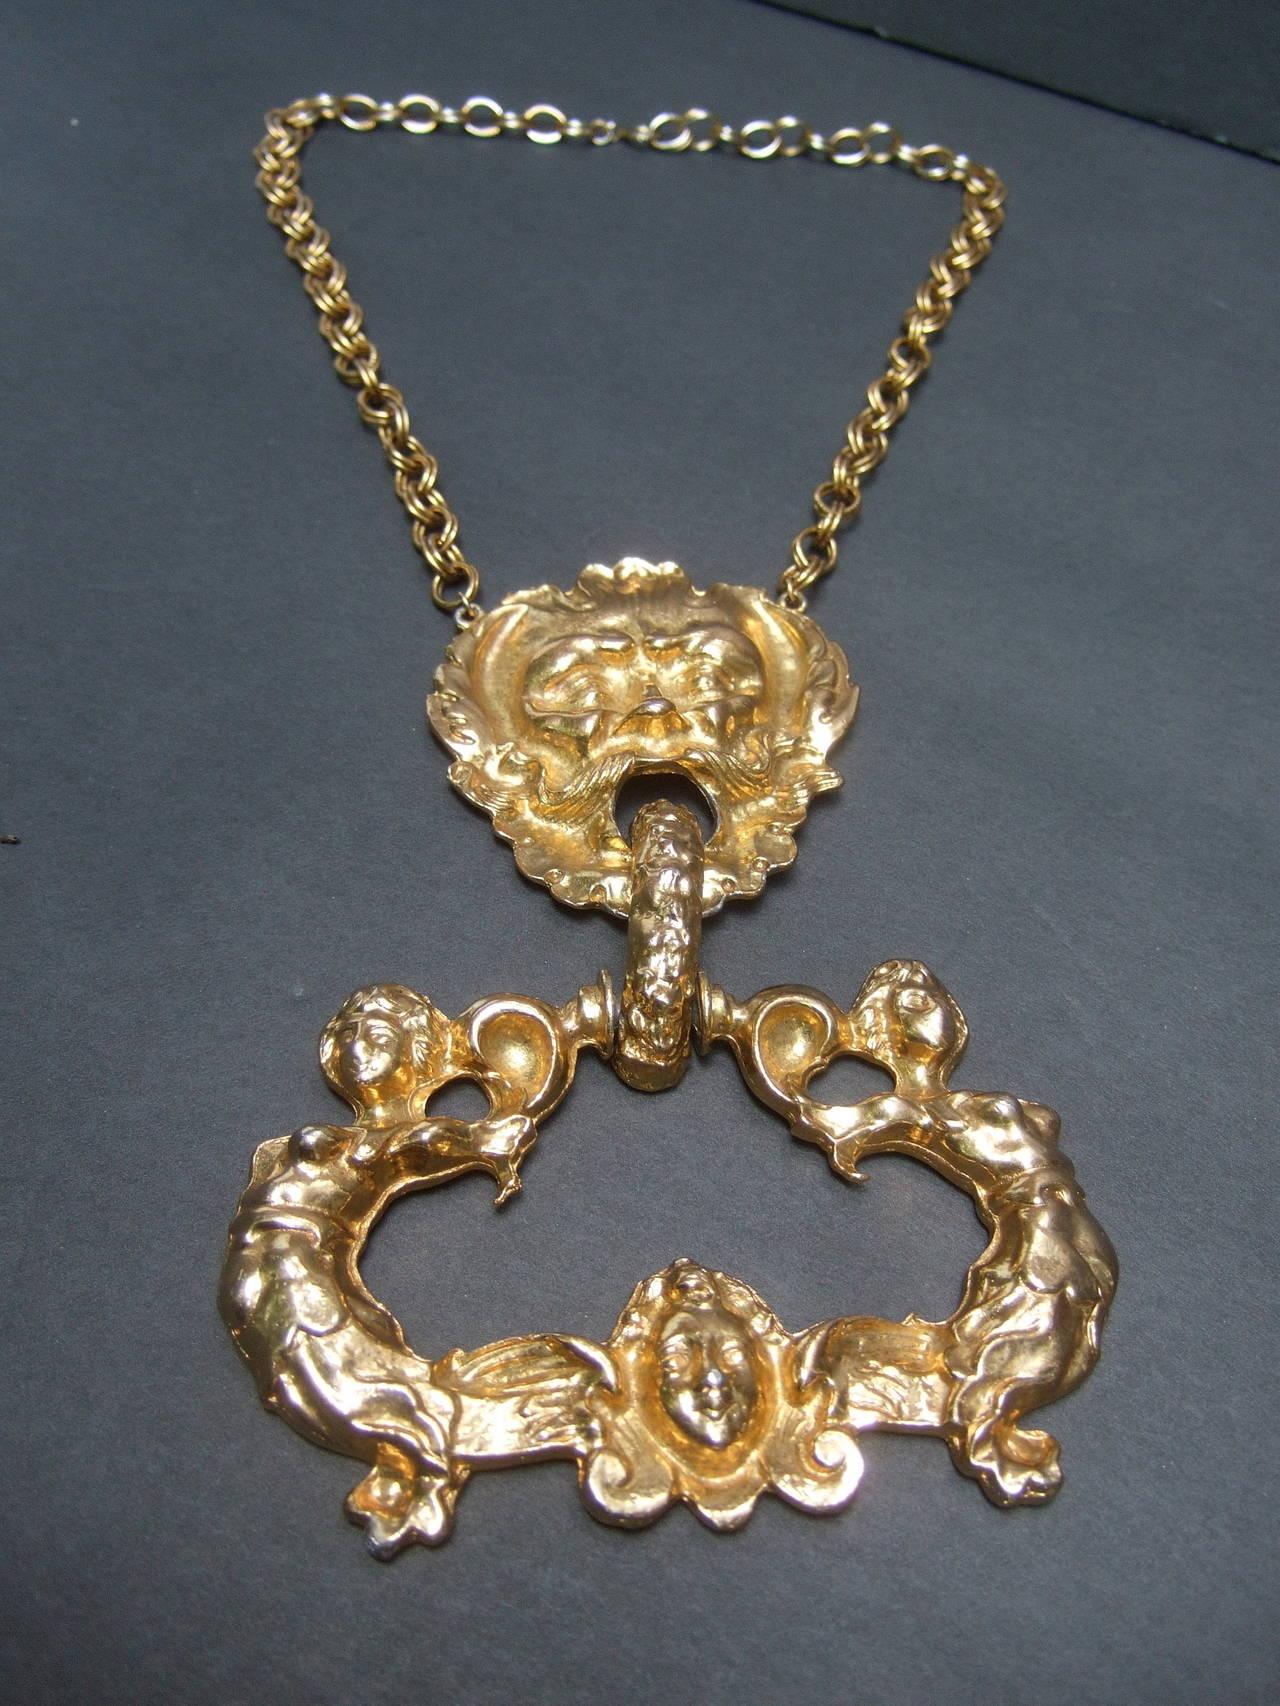 Massive Gilt Metal Figural Pendant Necklace c 1970 For Sale 1